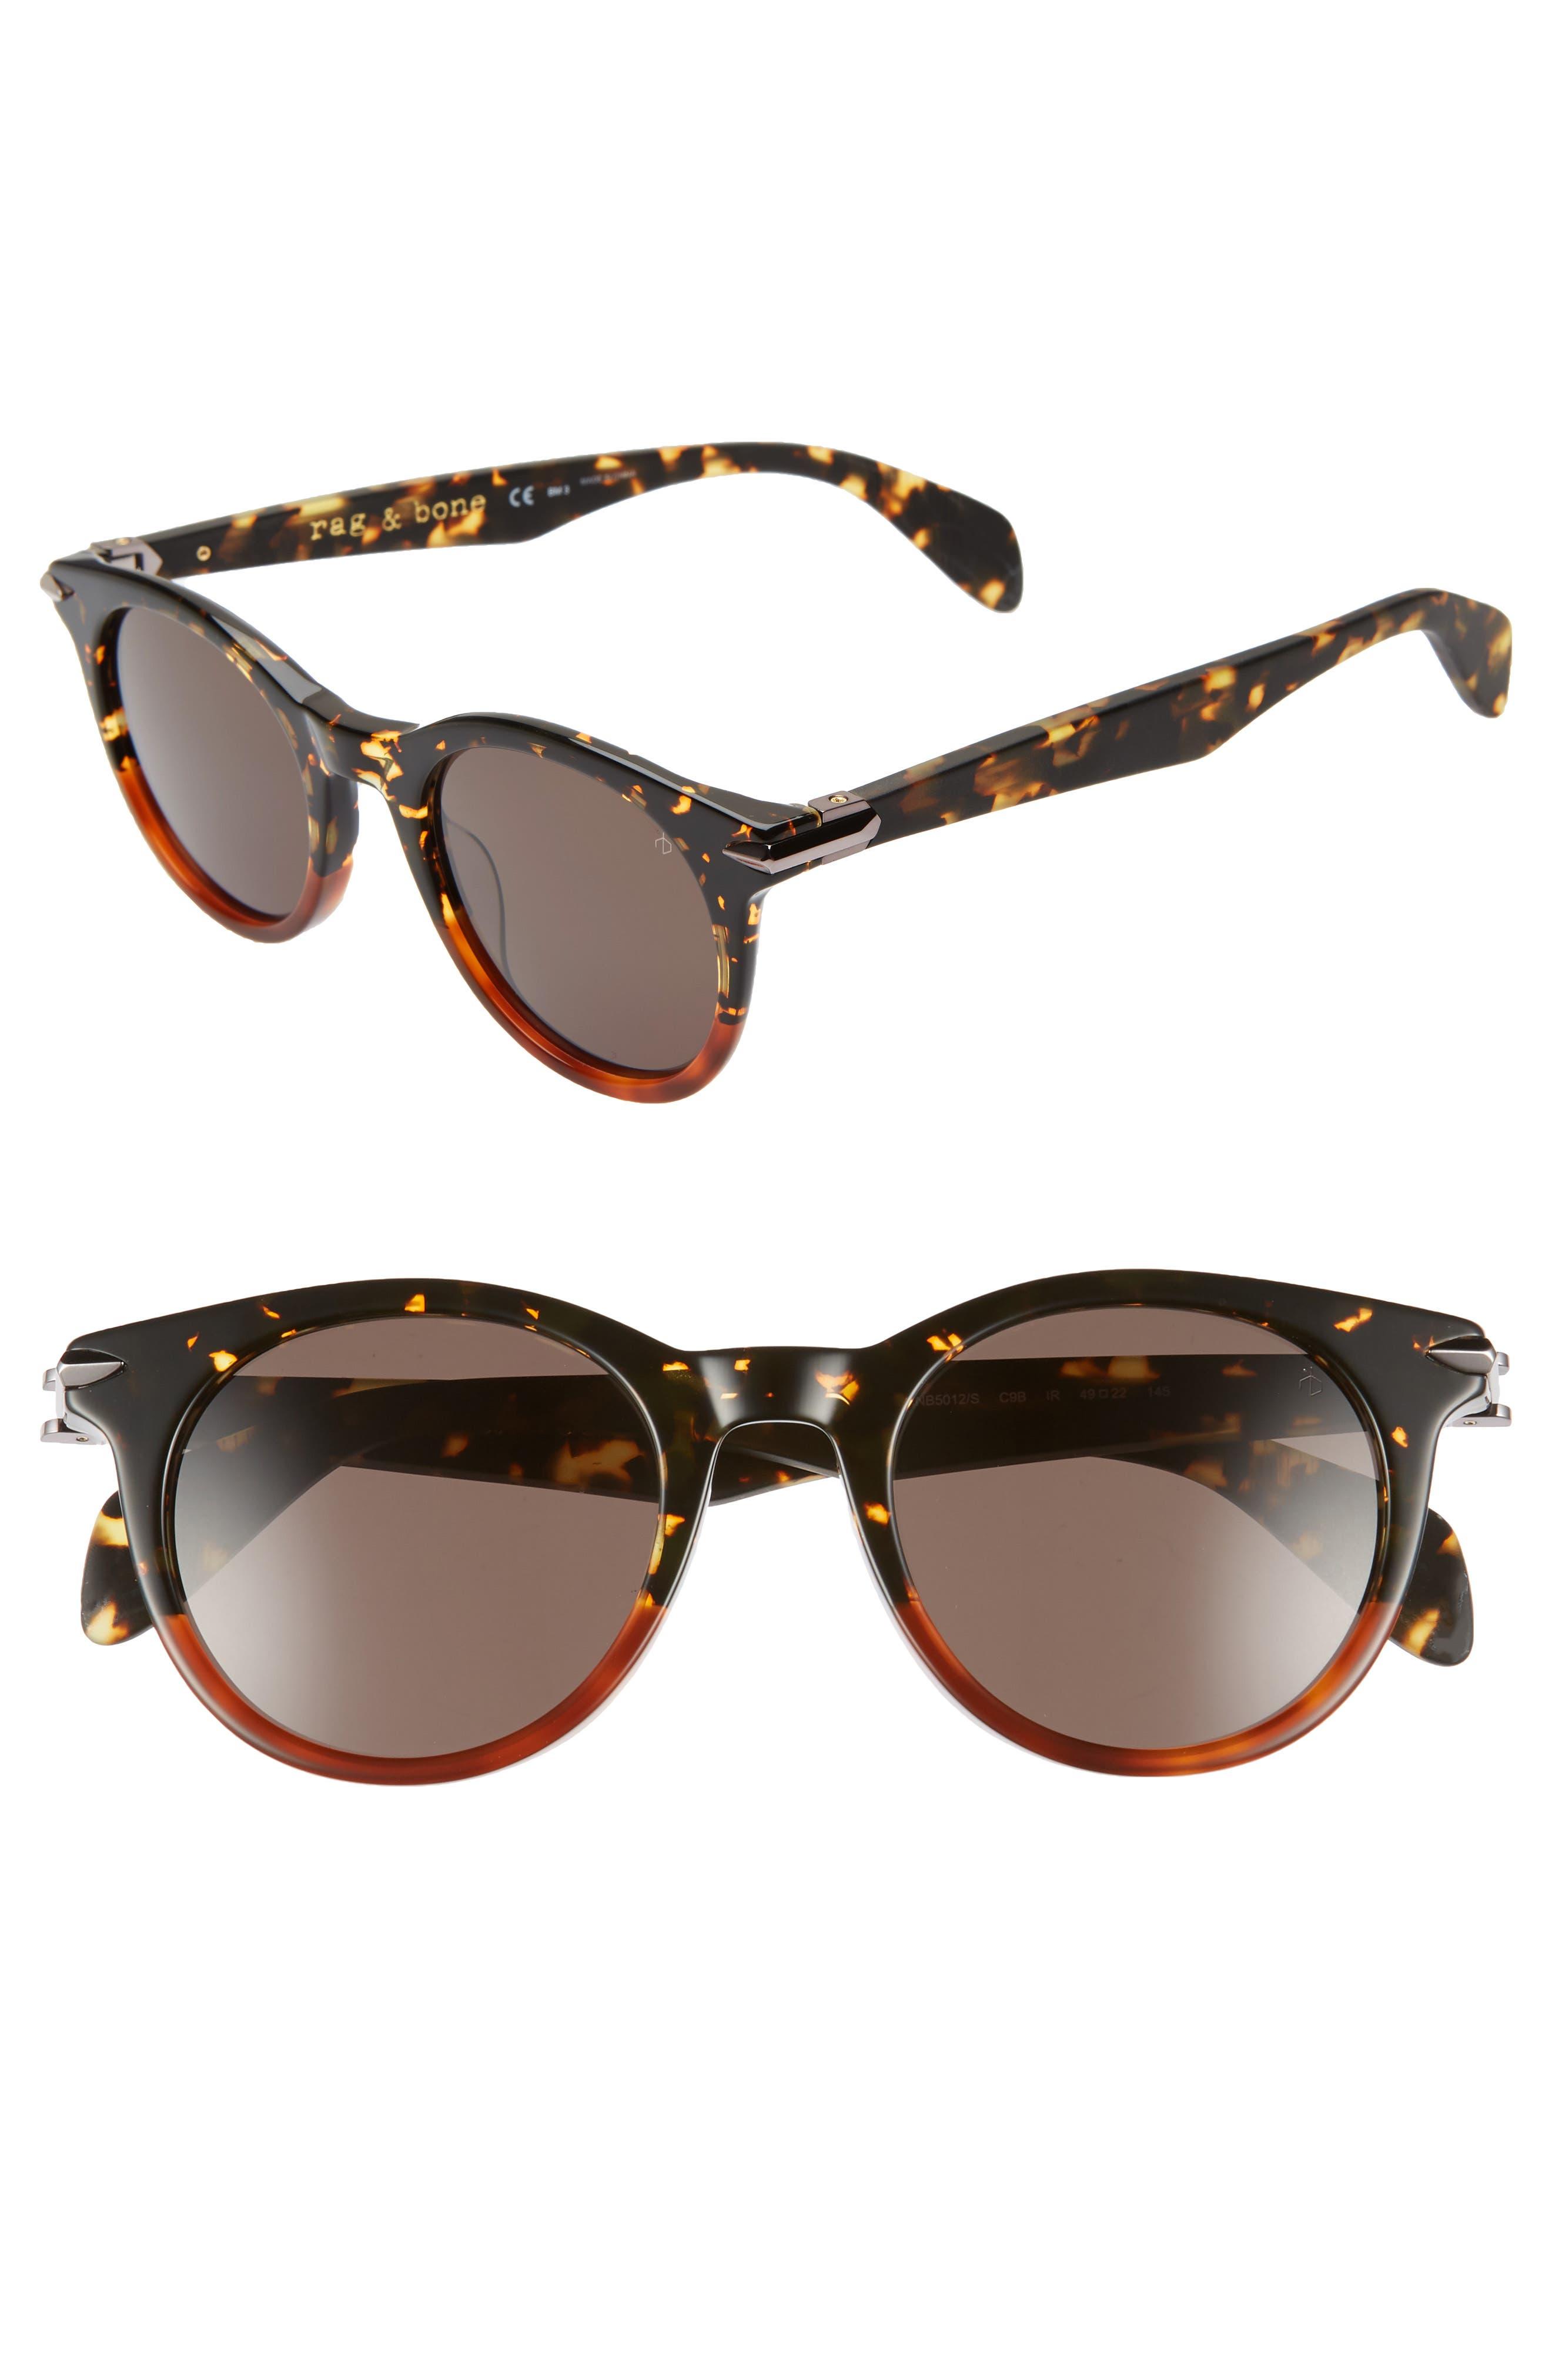 49mm Round Sunglasses,                             Main thumbnail 1, color,                             BLACK/ HAVANA HONEY